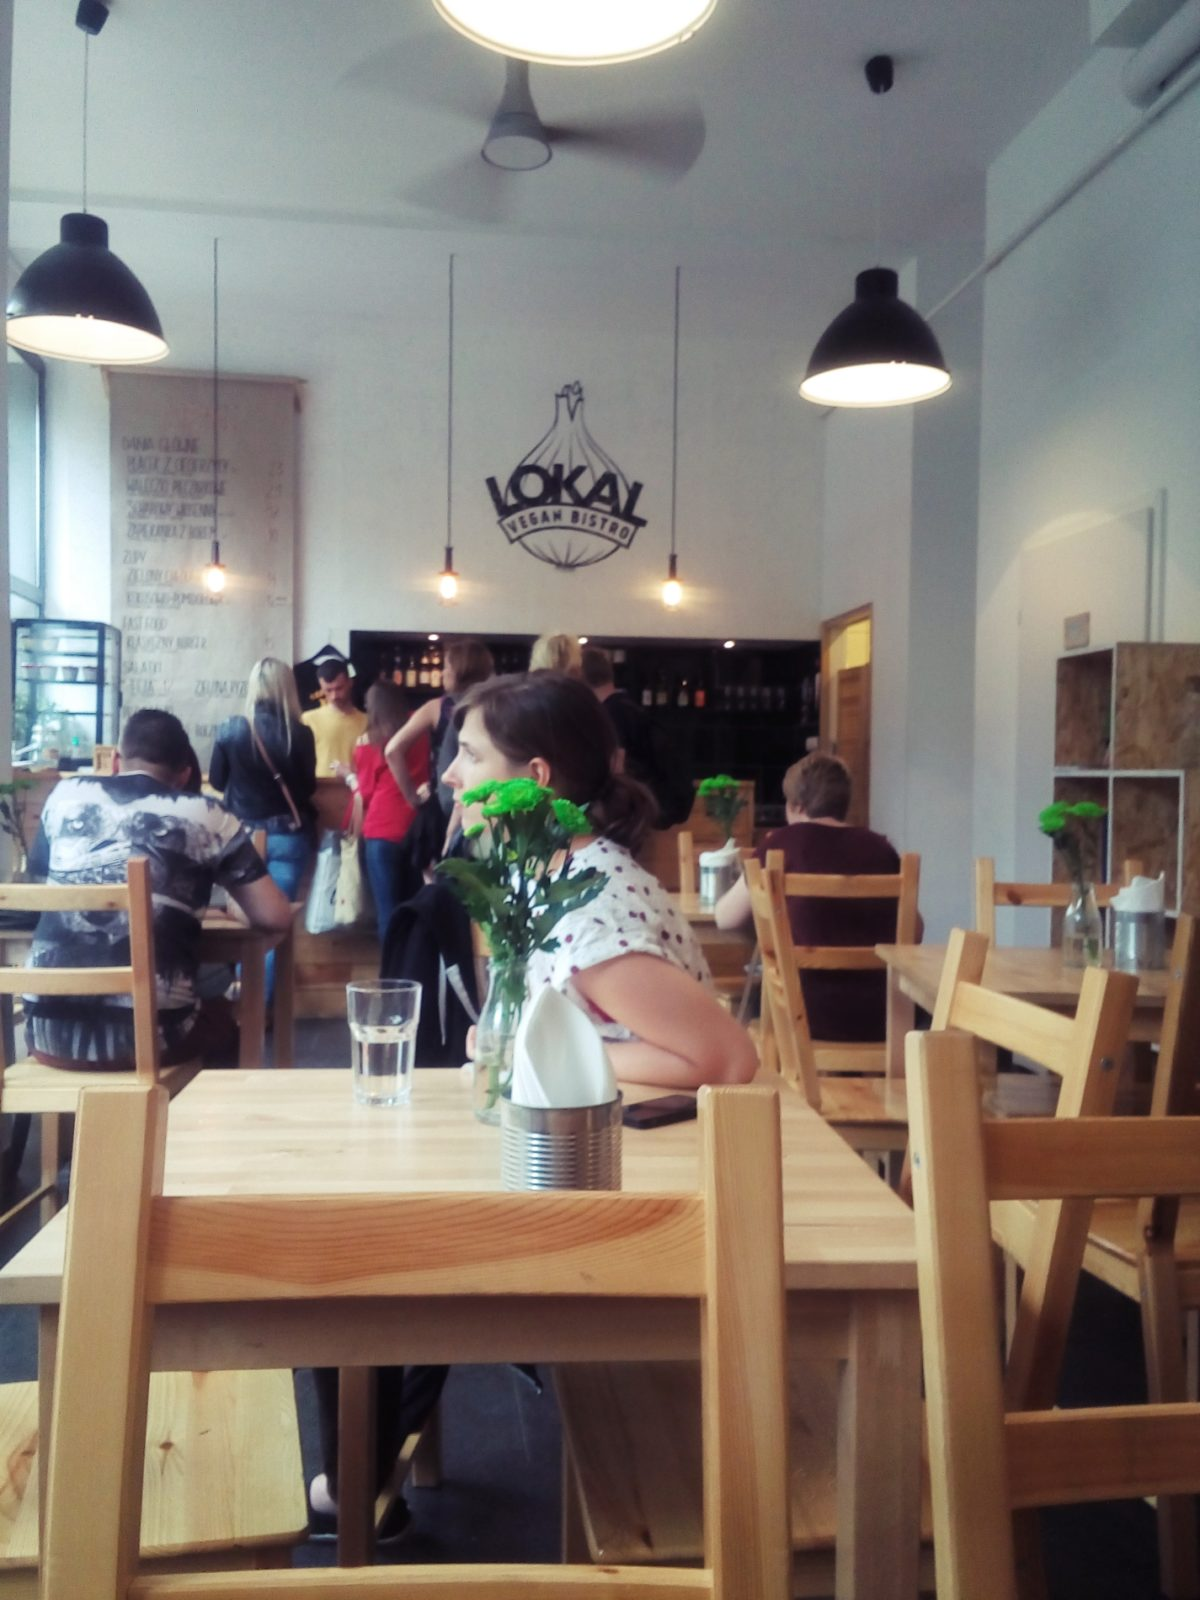 Wege Warszawa - Lokal Vegan Bistro